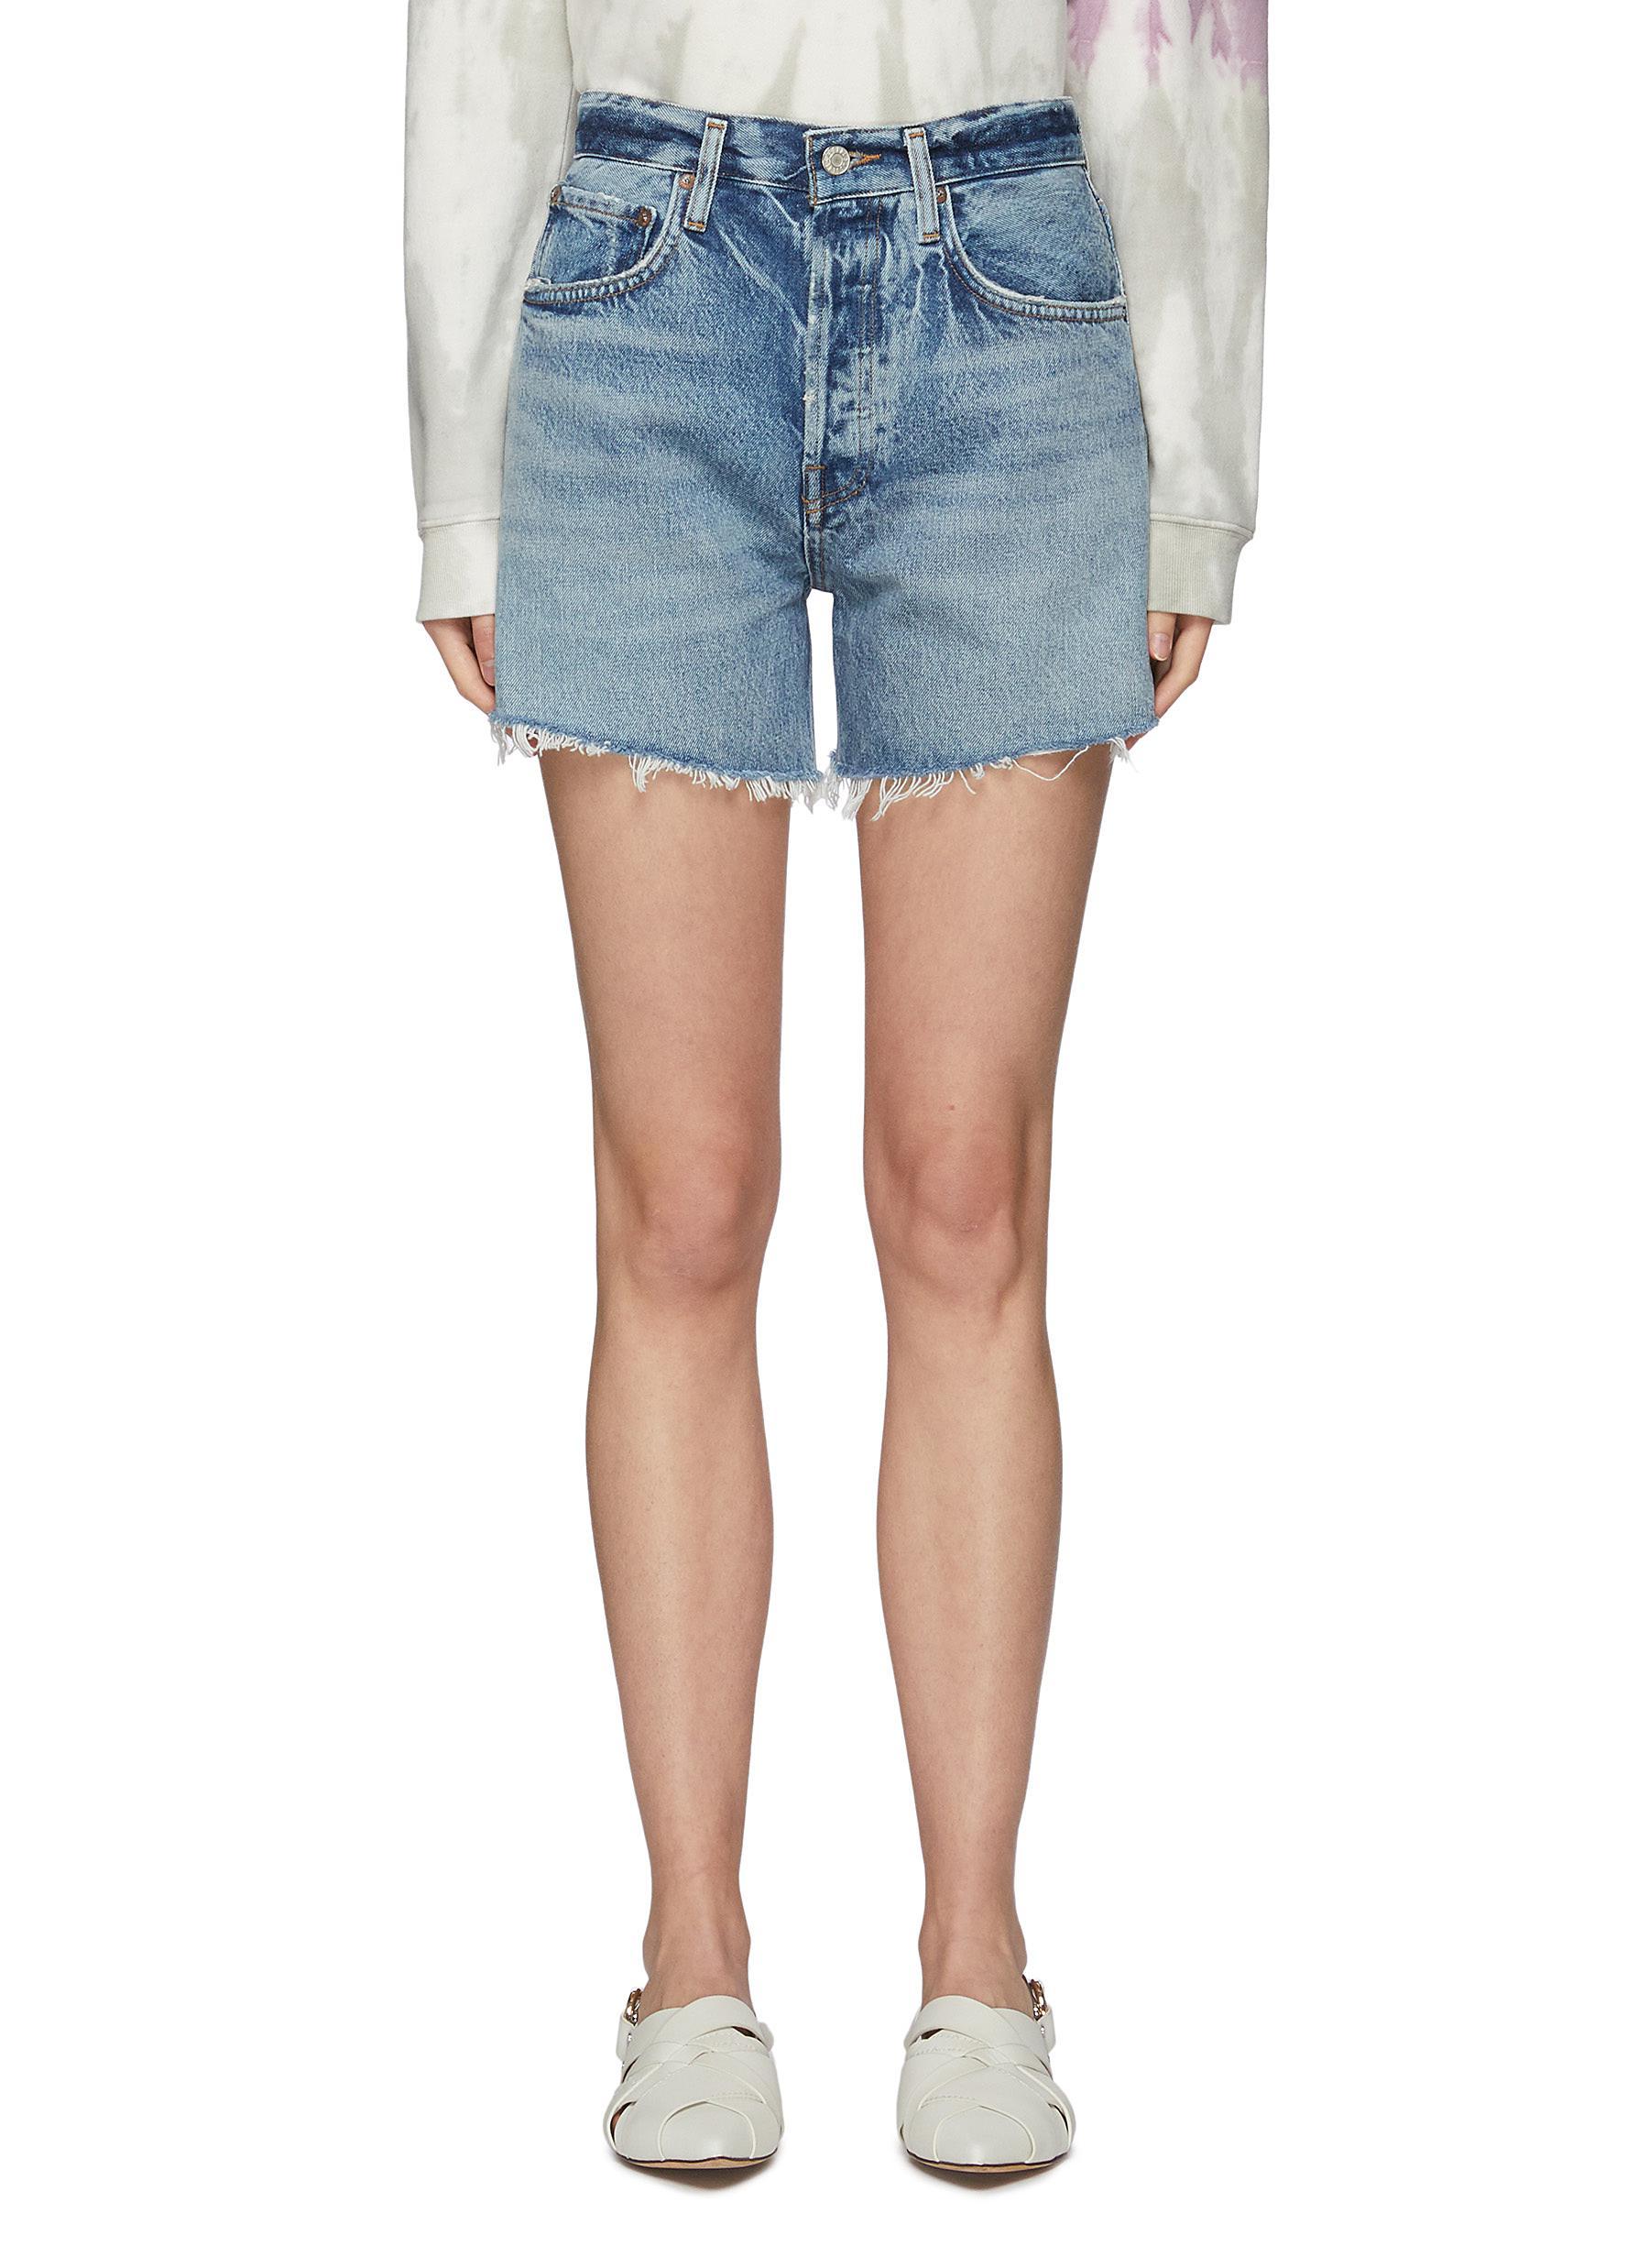 'Riley' Fray Hem Denim Shorts